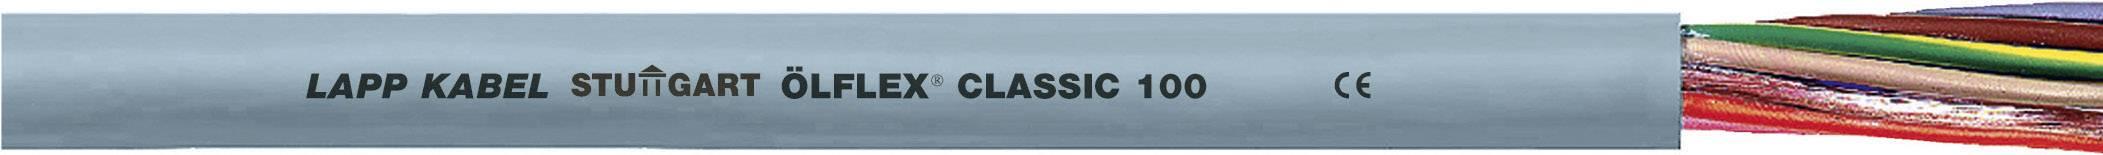 Kabel LappKabel Ölflex CLASSIC 100 12G0,75 (0010030), PVC, 9,9 mm, 500 V, šedá, 100 m